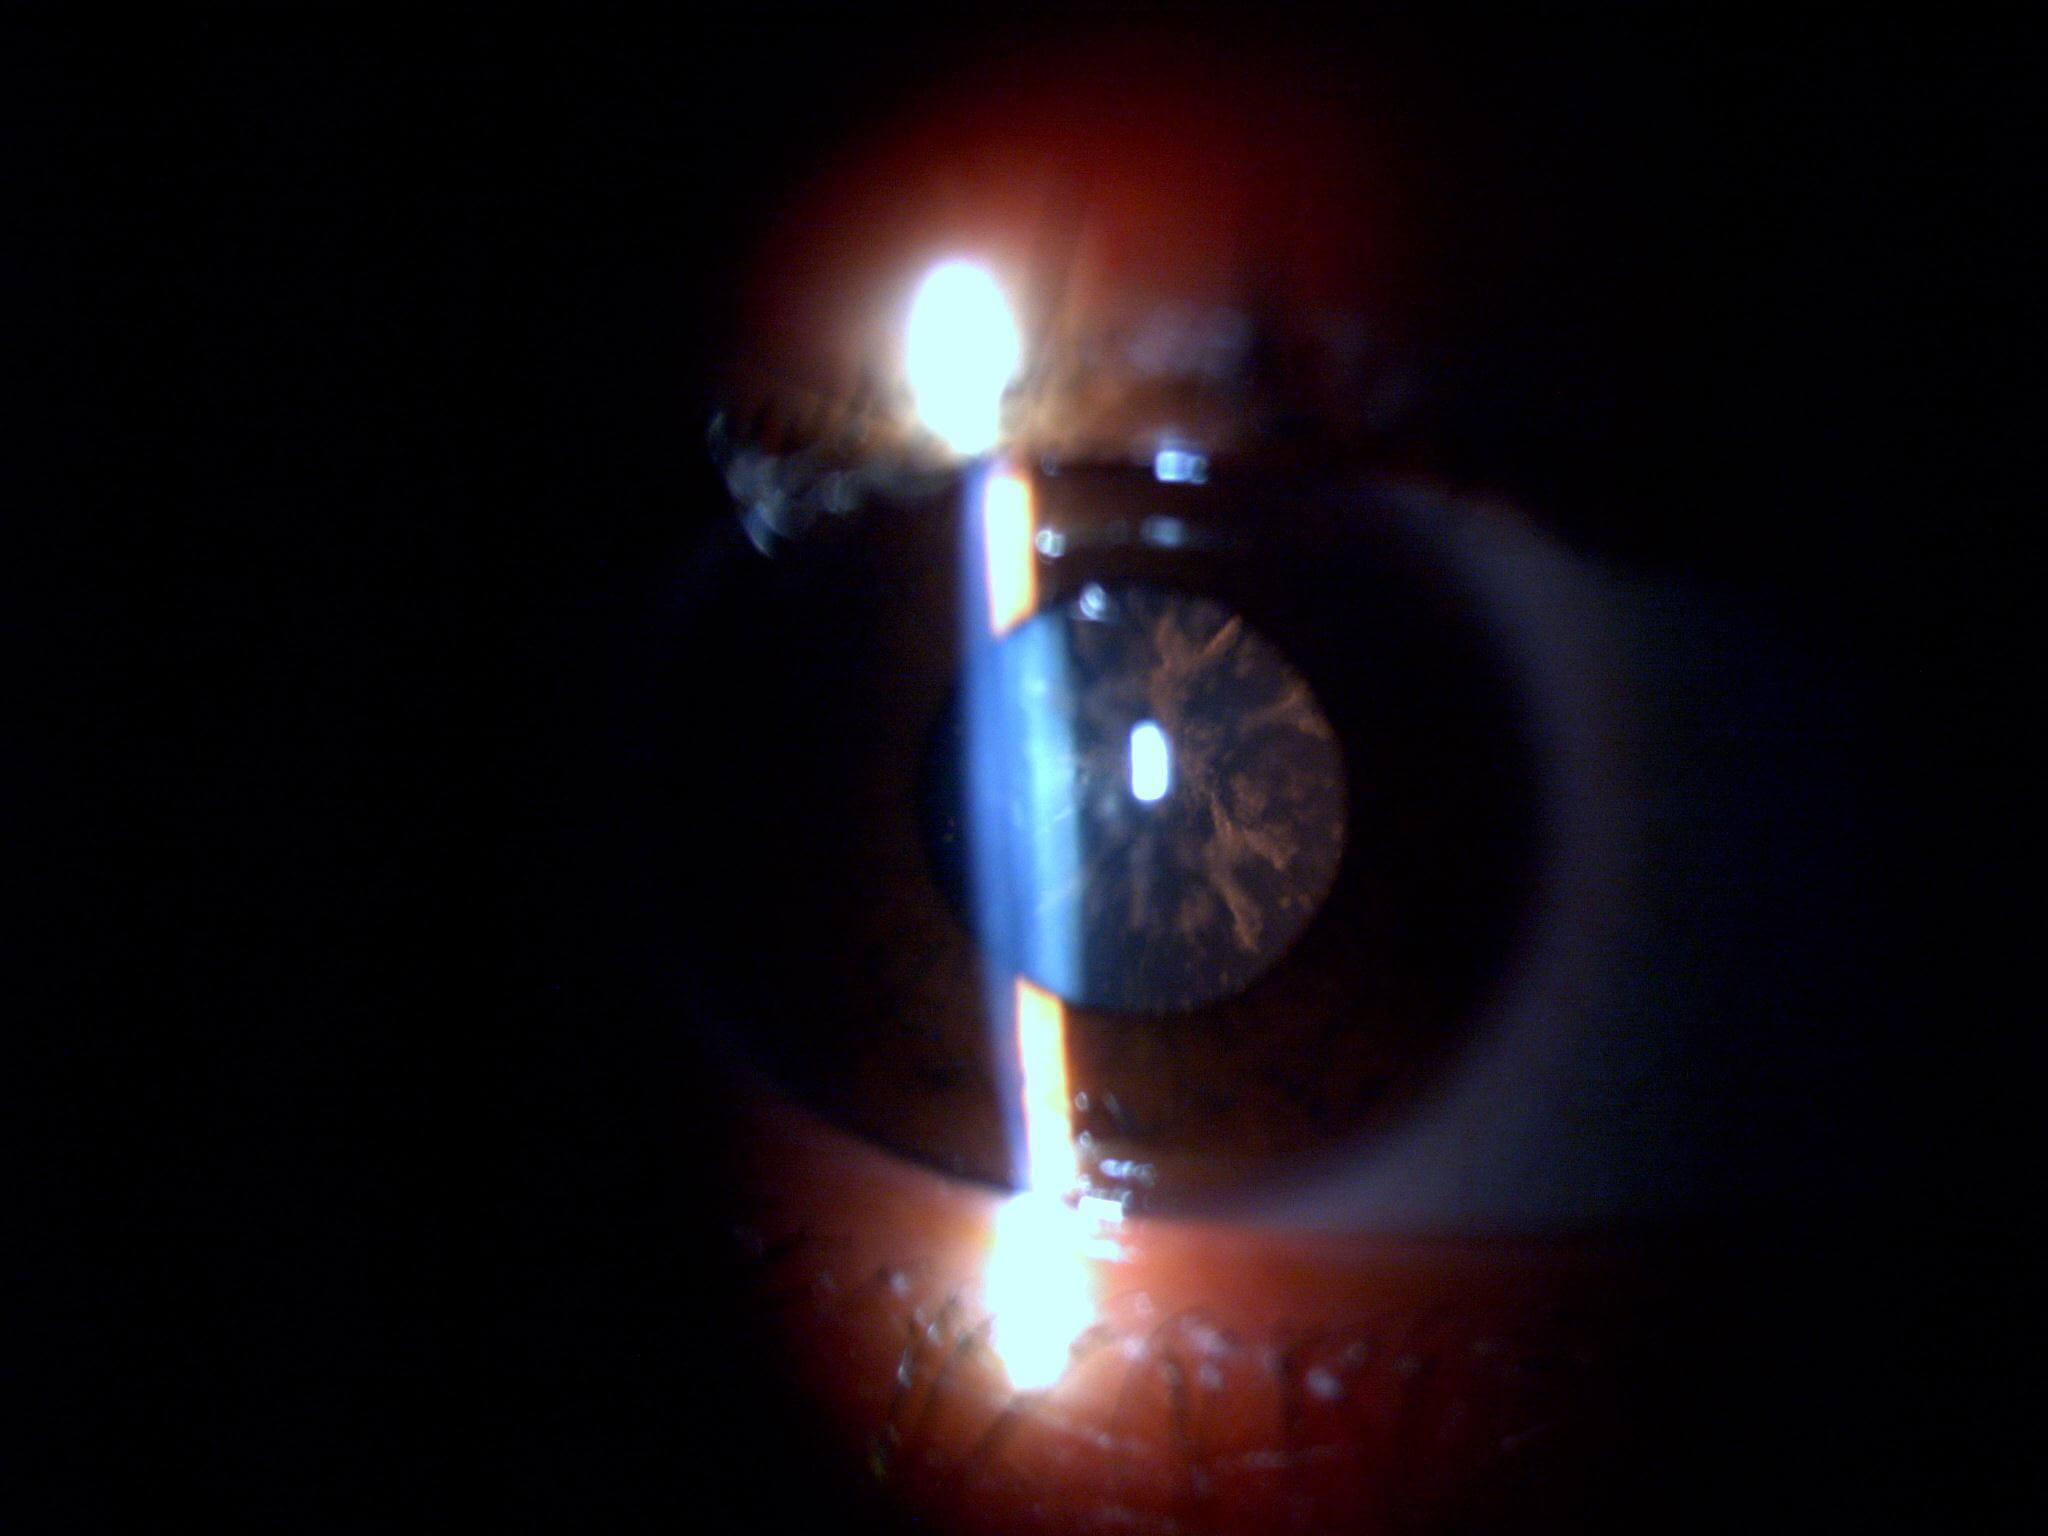 Snowflake cataract